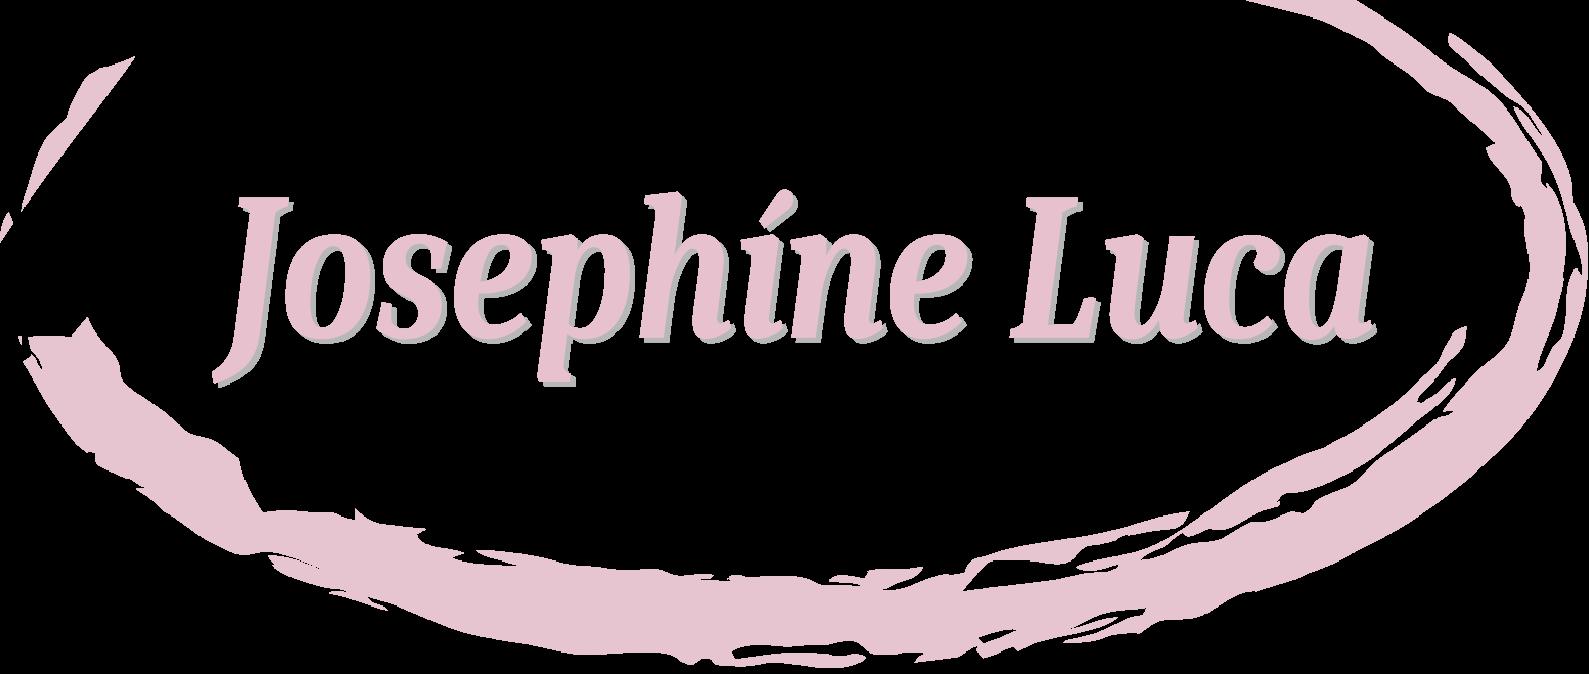 Josephine Luca Logo